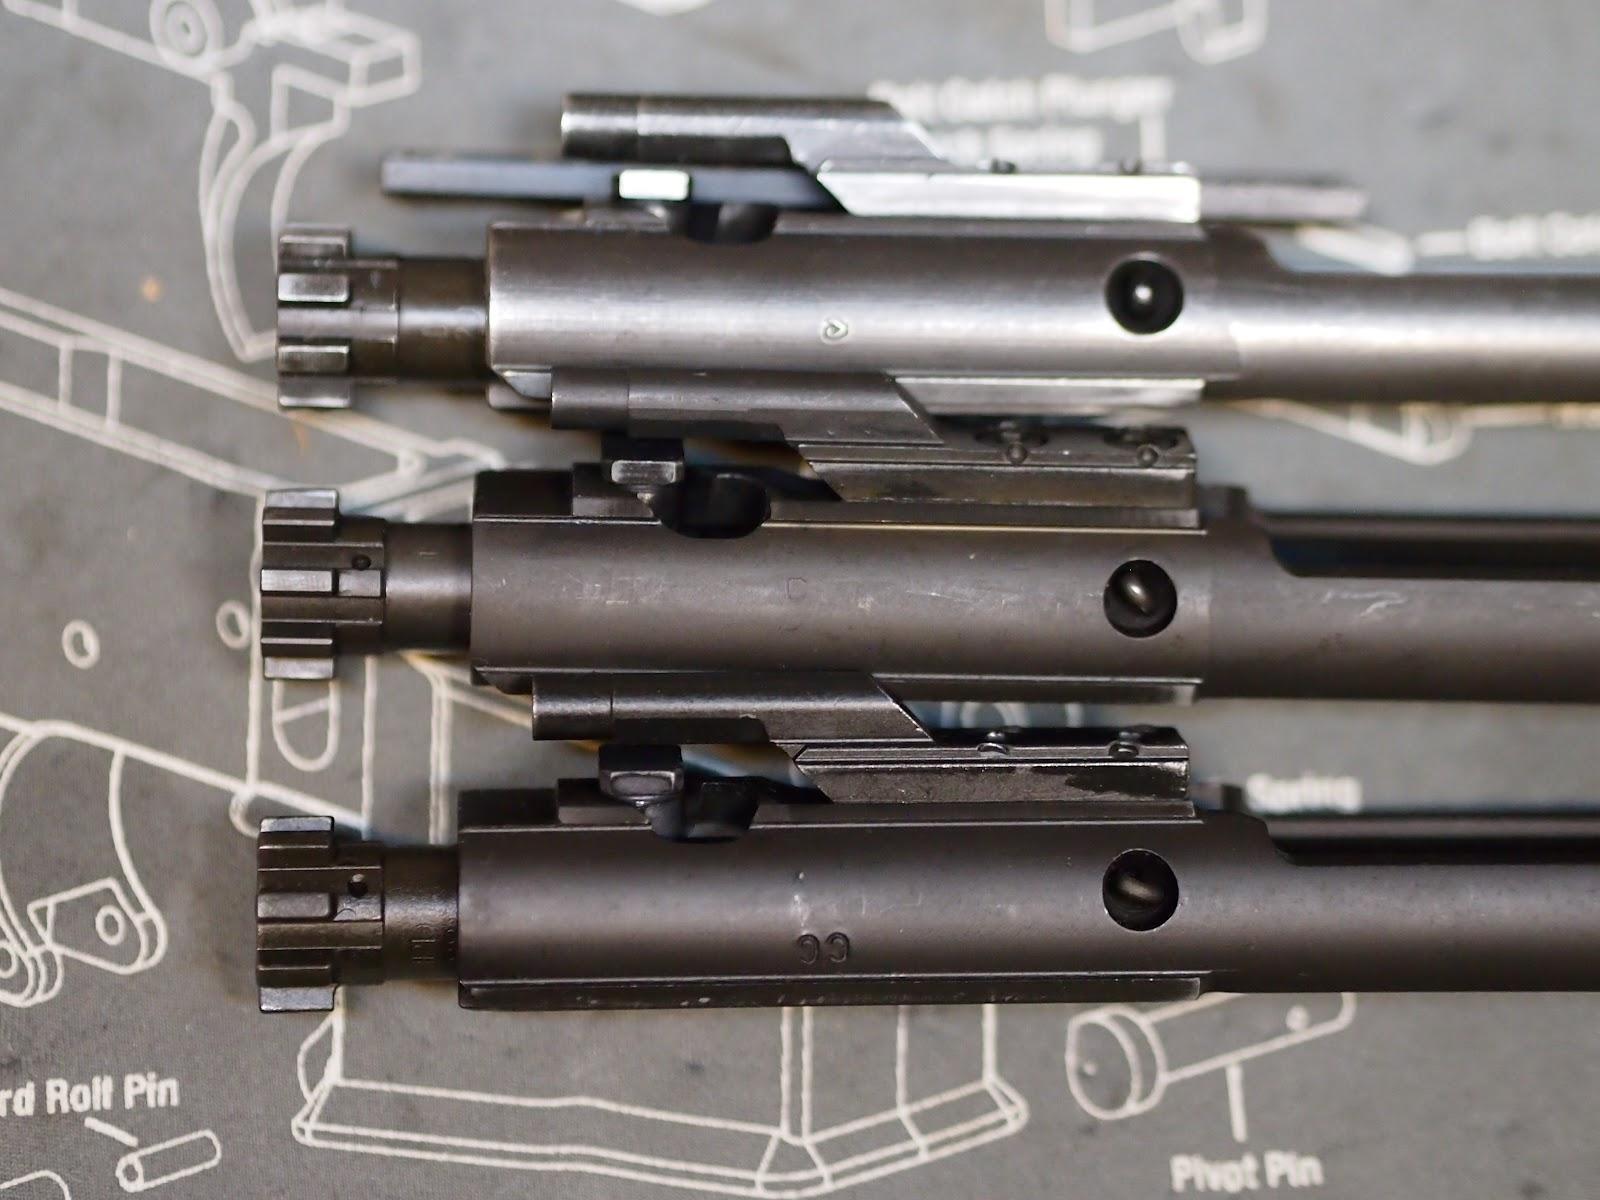 Mister Donut's Firearms Blog: Mk12 build - Diemaco BCG, Aero